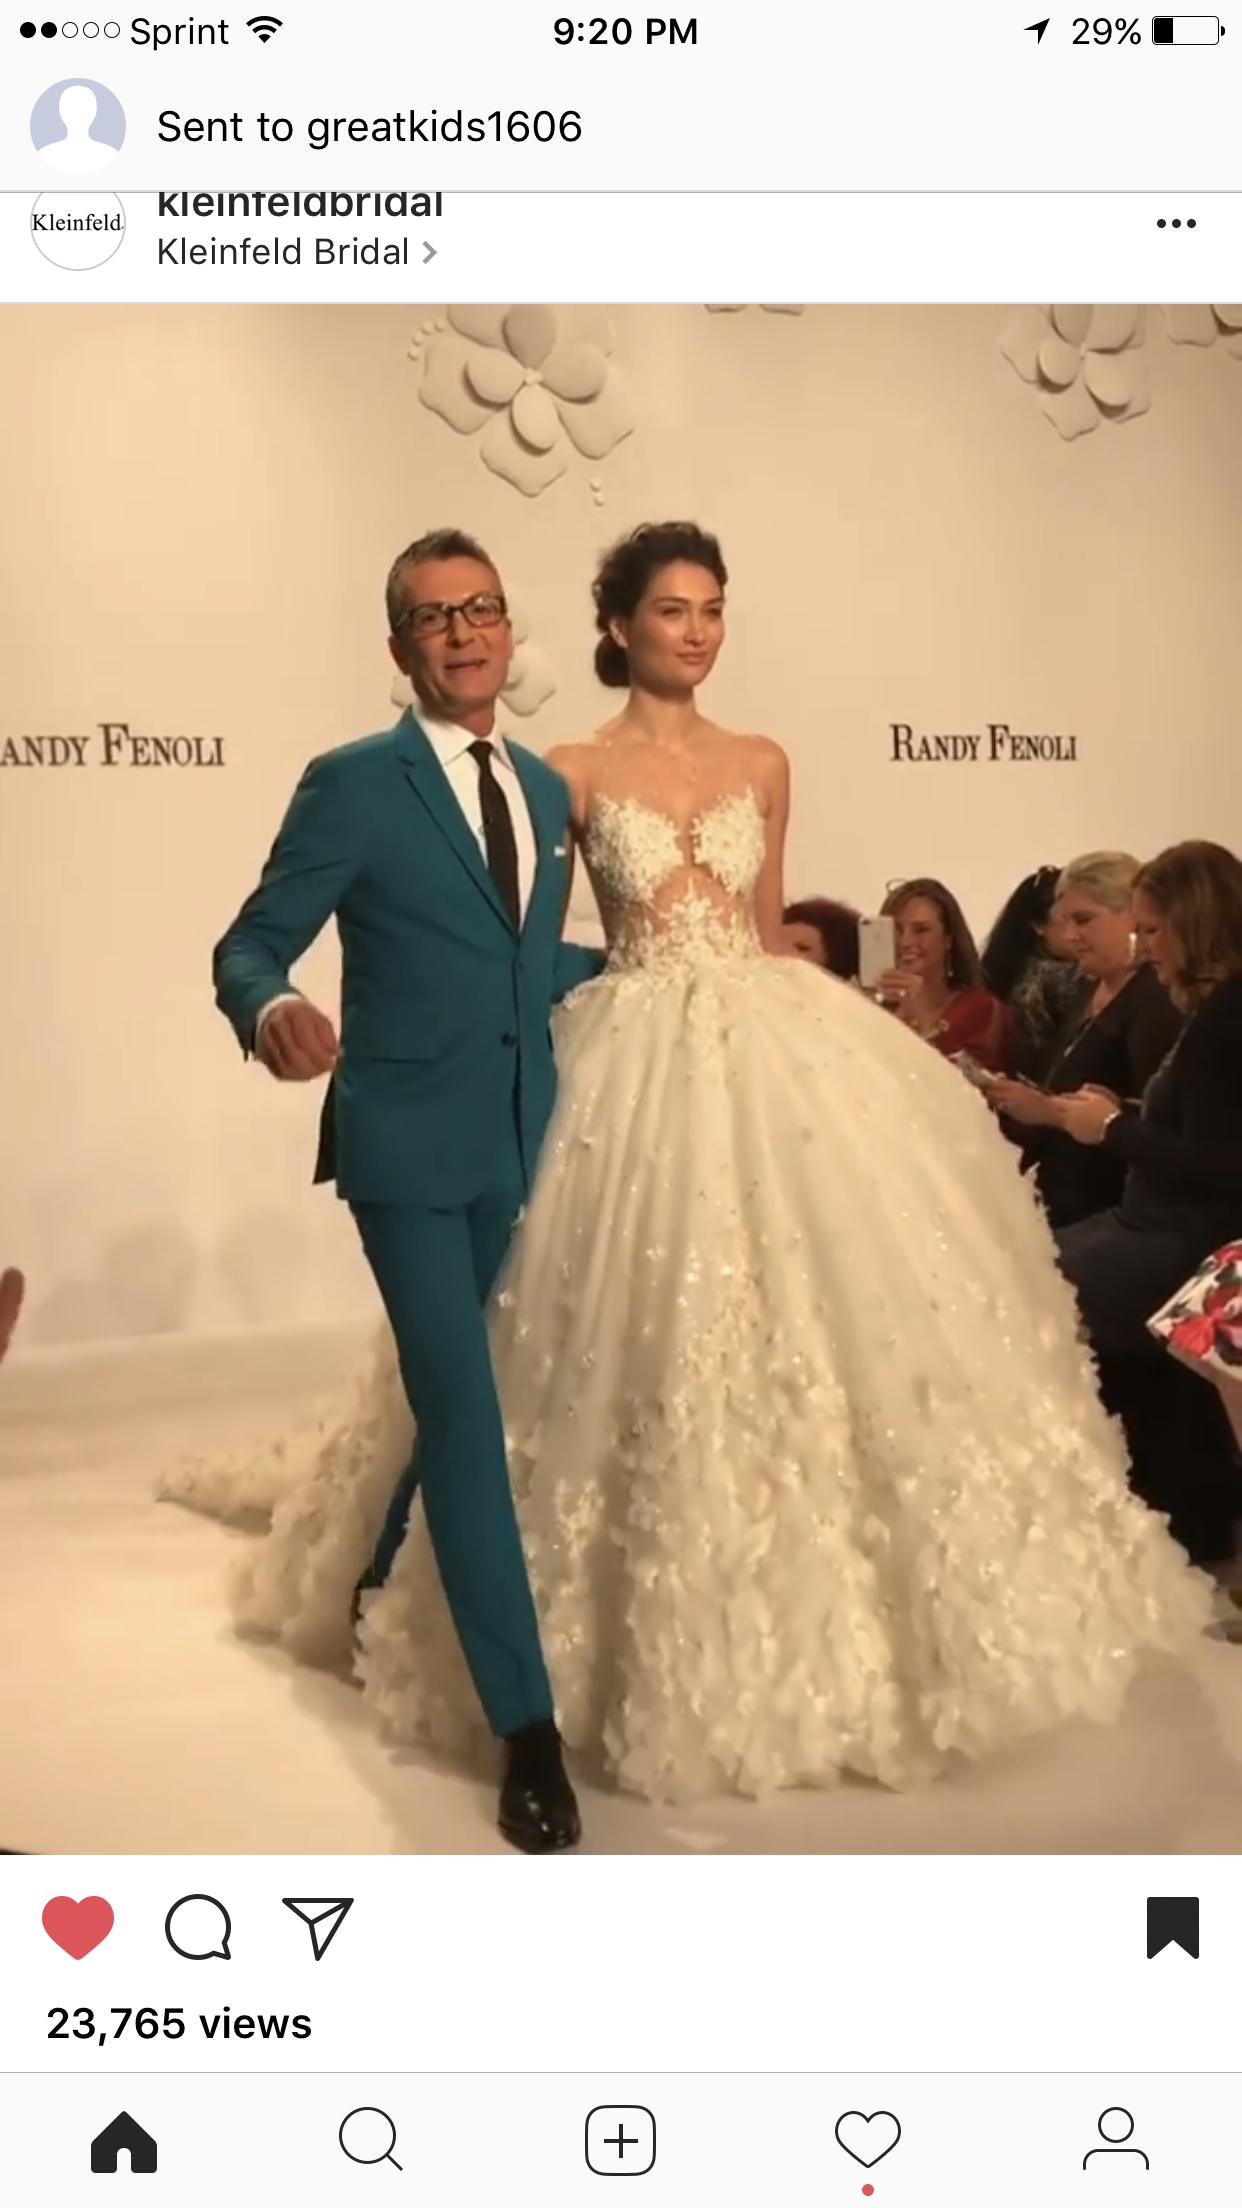 Randy fenoli first wedding dress collection runway romantic